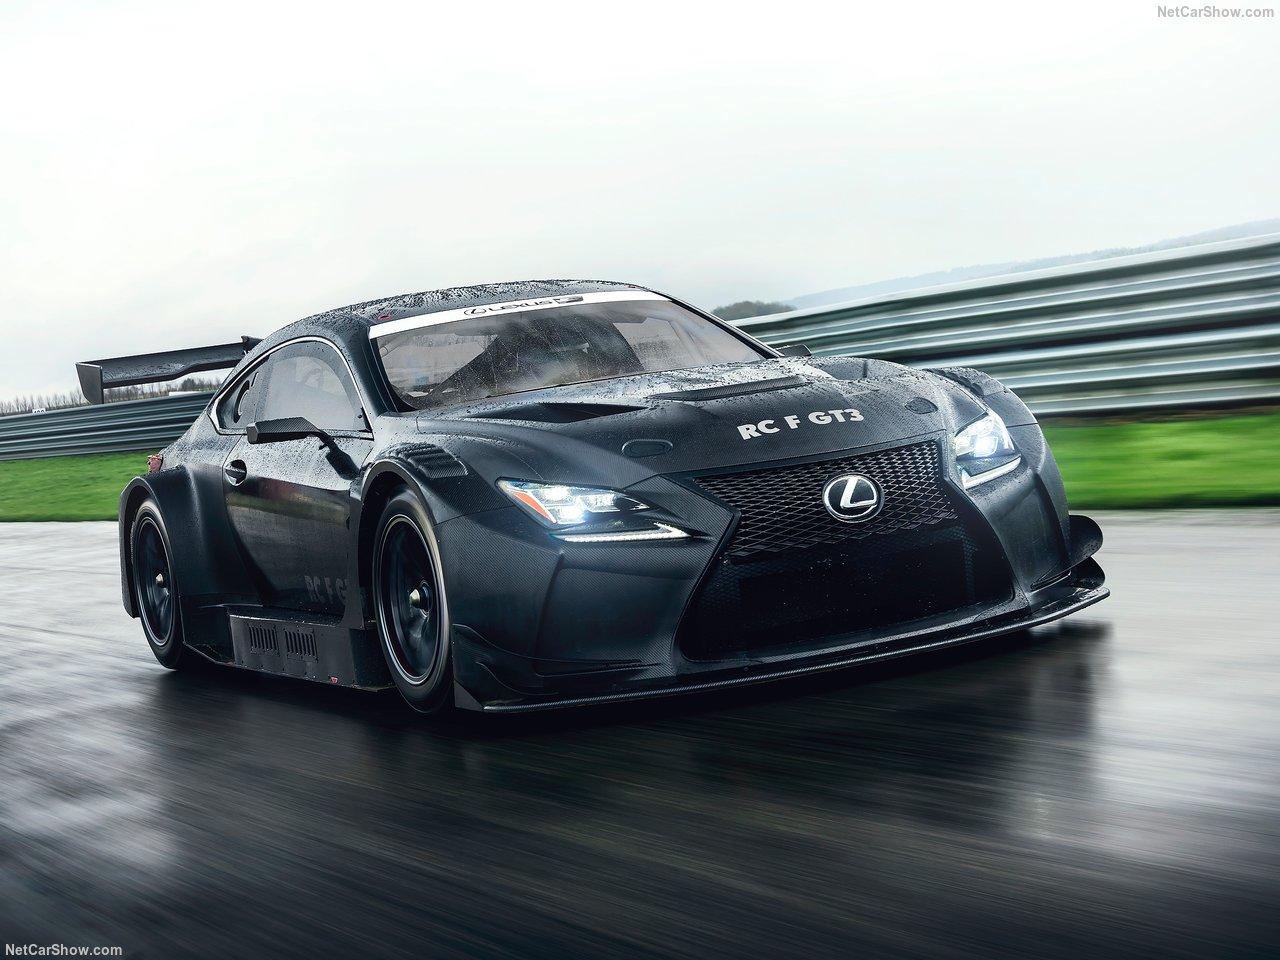 Trd Pro Tundra >> 2017 Lexus RC F GT3 * Price * Specs * Engine * Design ...